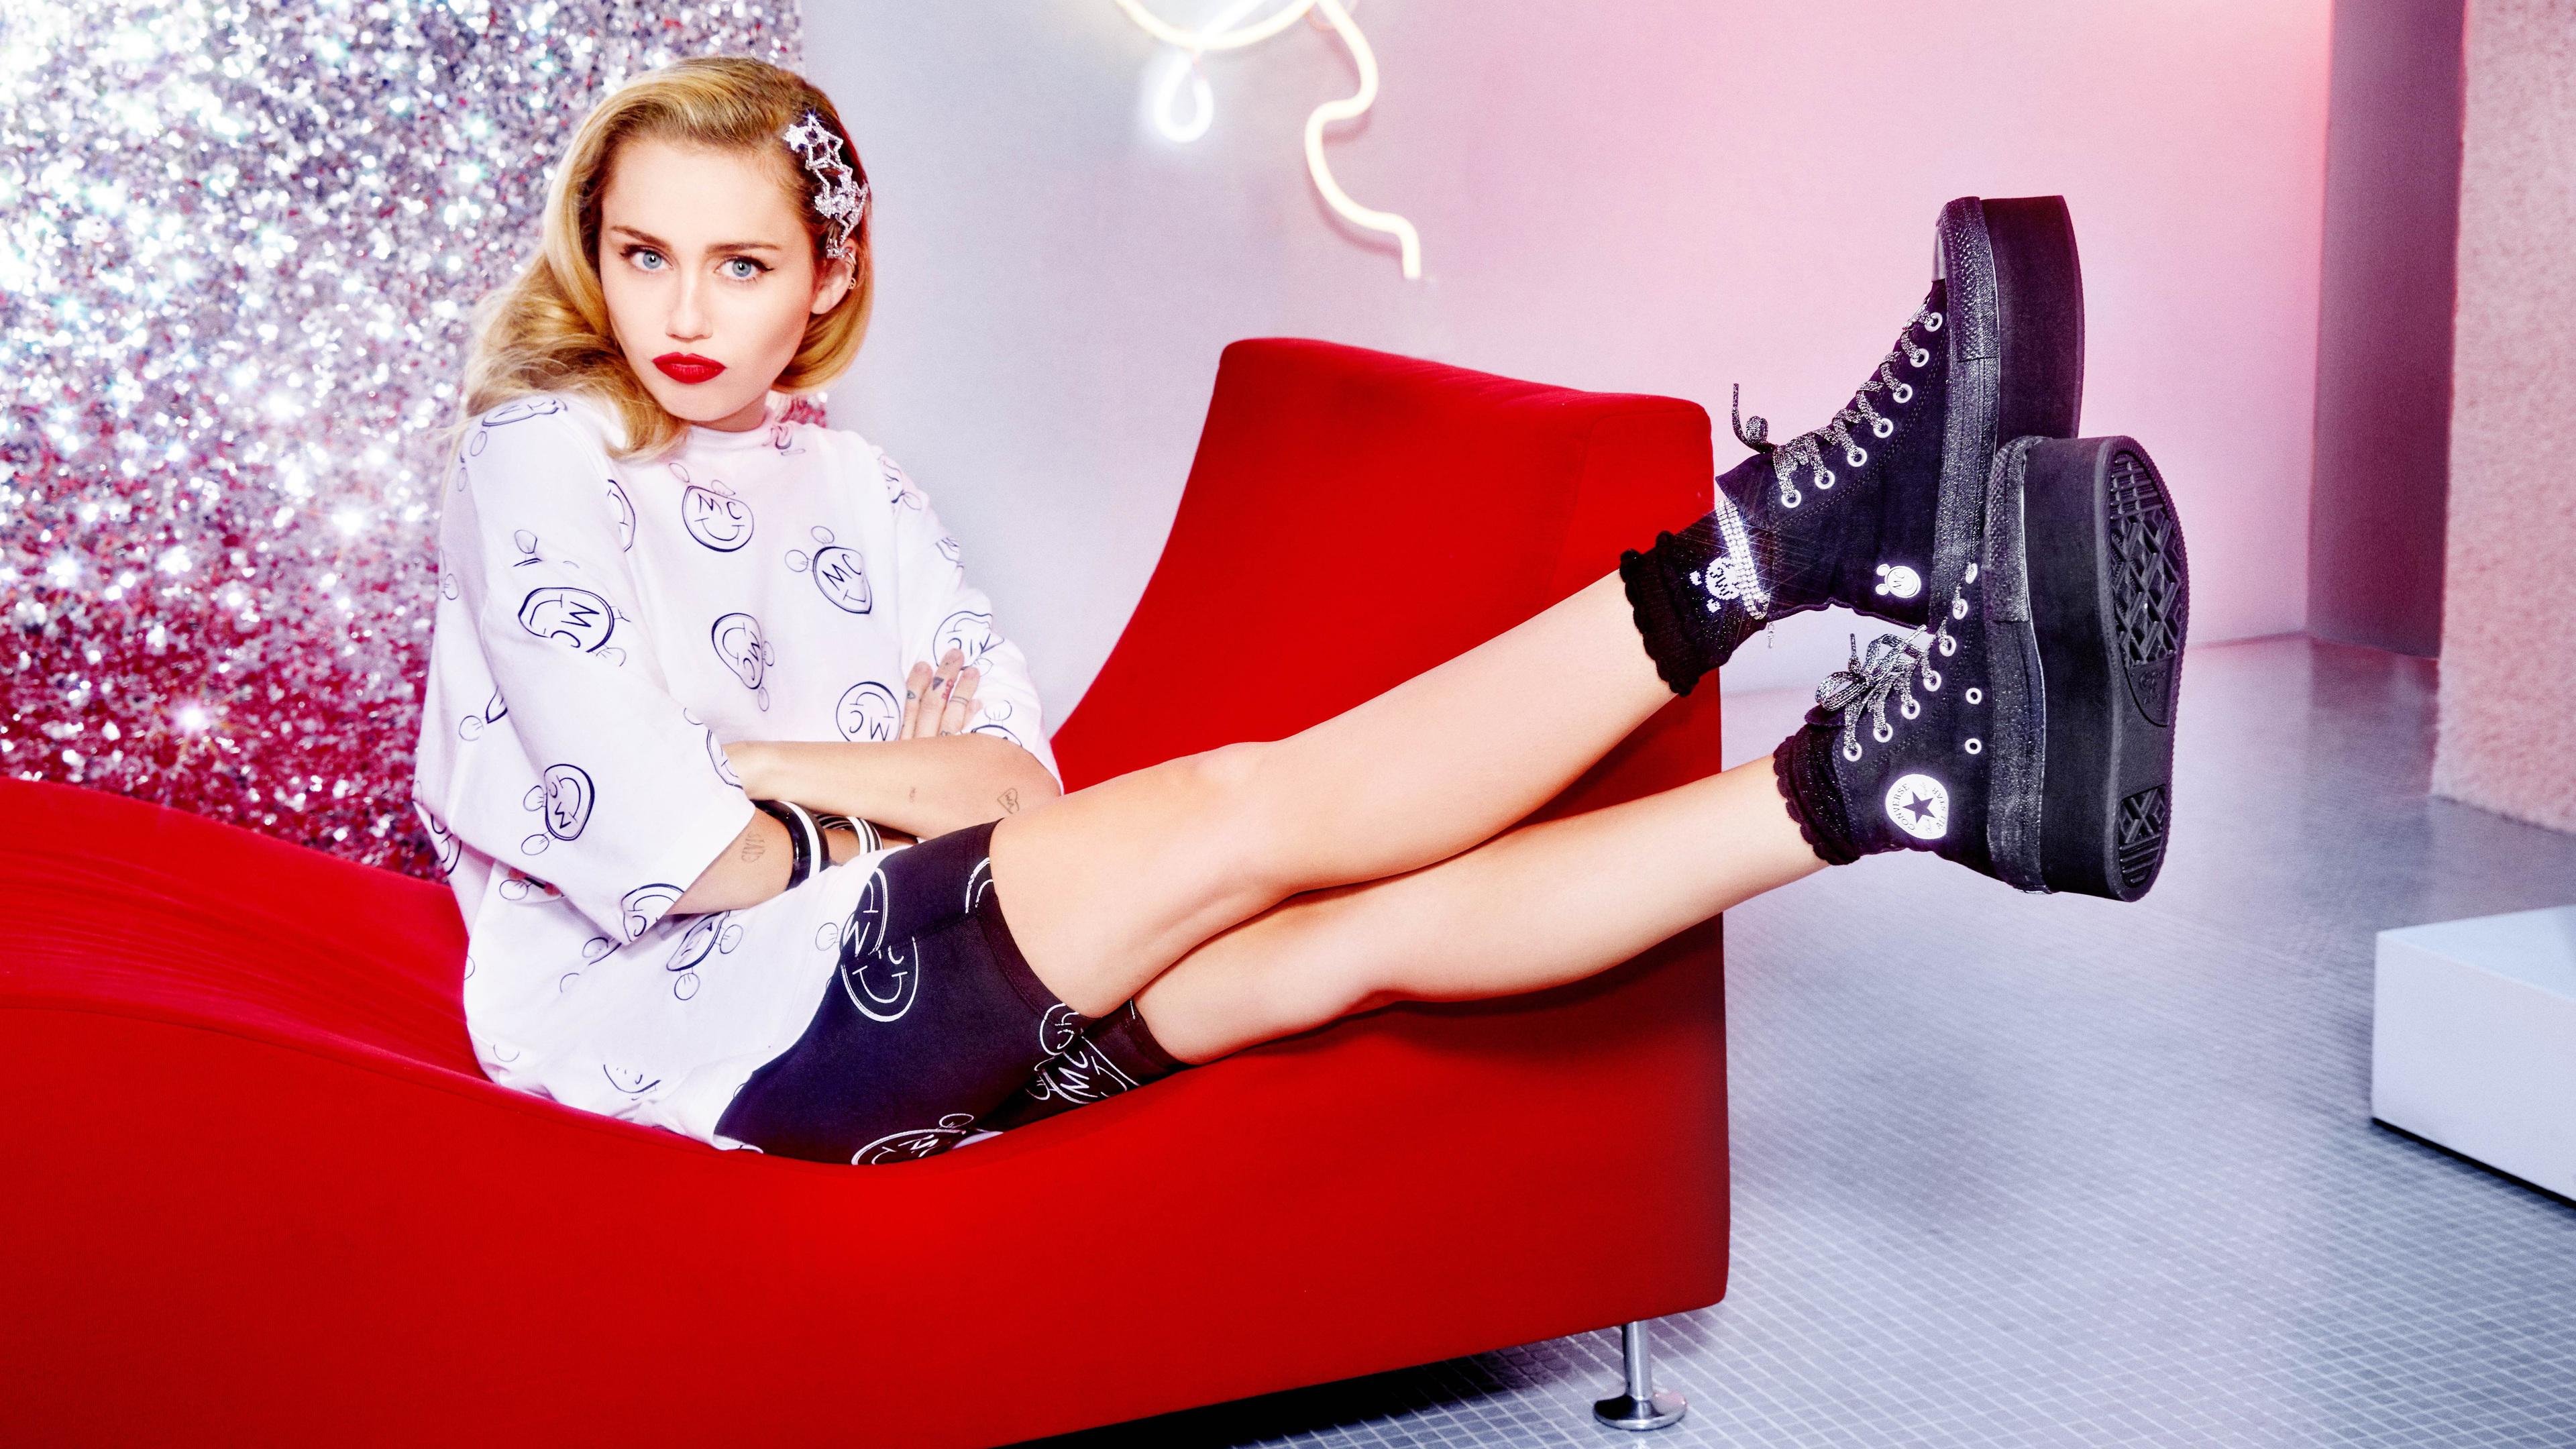 miley cyrus converse x 5k 1536948834 - Miley Cyrus Converse X 5k - singer wallpapers, music wallpapers, miley cyrus wallpapers, hd-wallpapers, girls wallpapers, celebrities wallpapers, 5k wallpapers, 4k-wallpapers